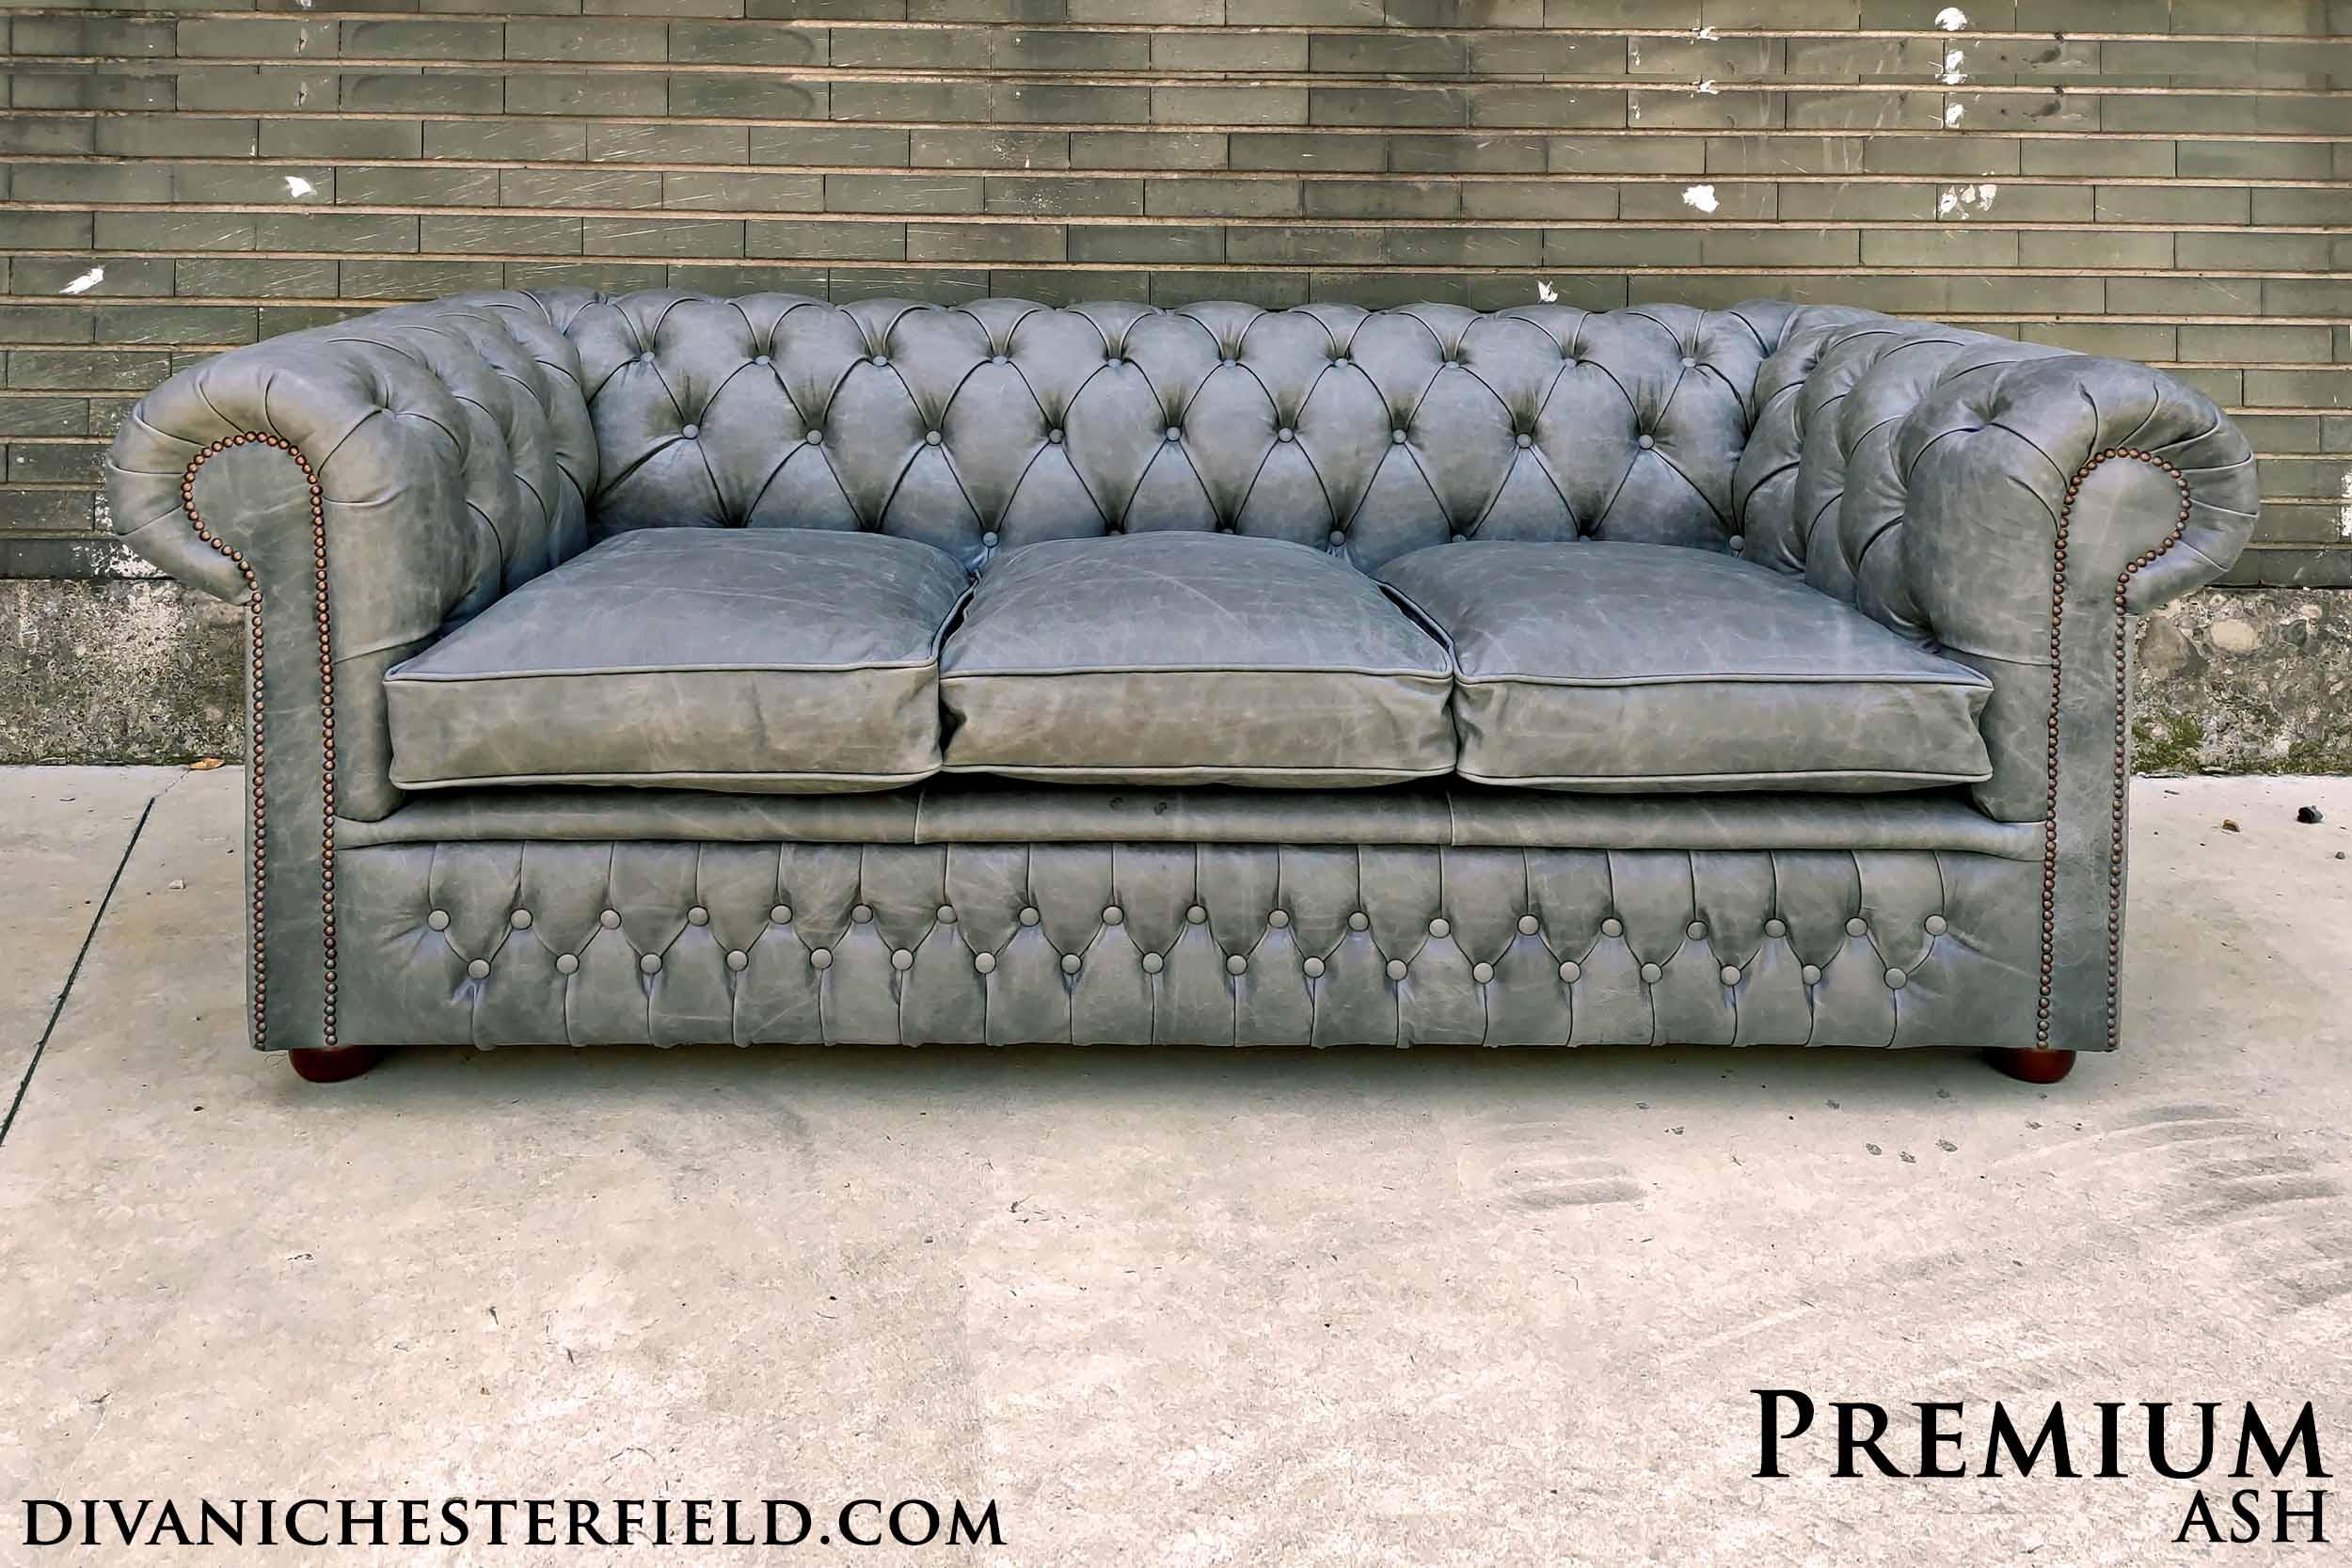 Divano Chesterfield Moderno.Divani Chesterfield Pelle Luxury Heritage Nuovi Inglesi